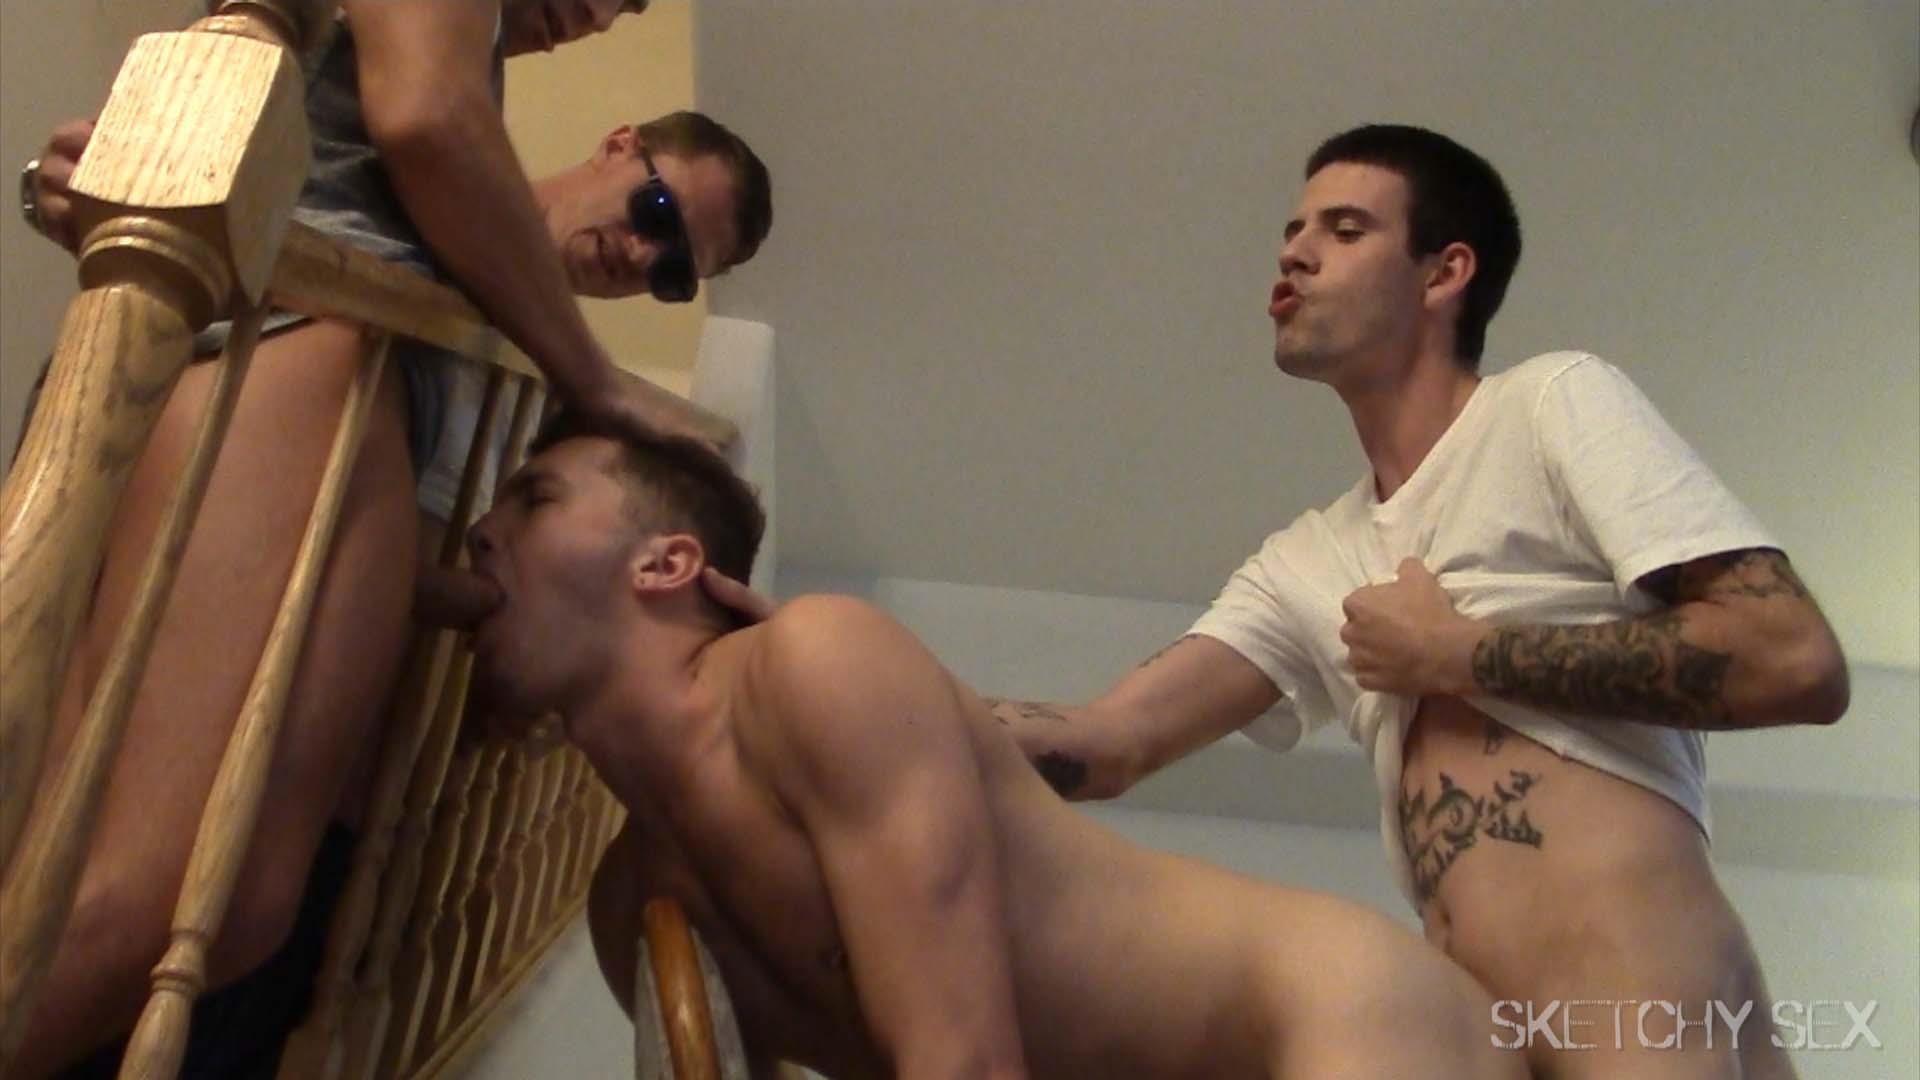 Sketchy-Sex-Bareback-Sex-Orgy-Amateur-Gay-Porn-06 All Out Bareback Sex Buffet At The Sketchy Sex Condo